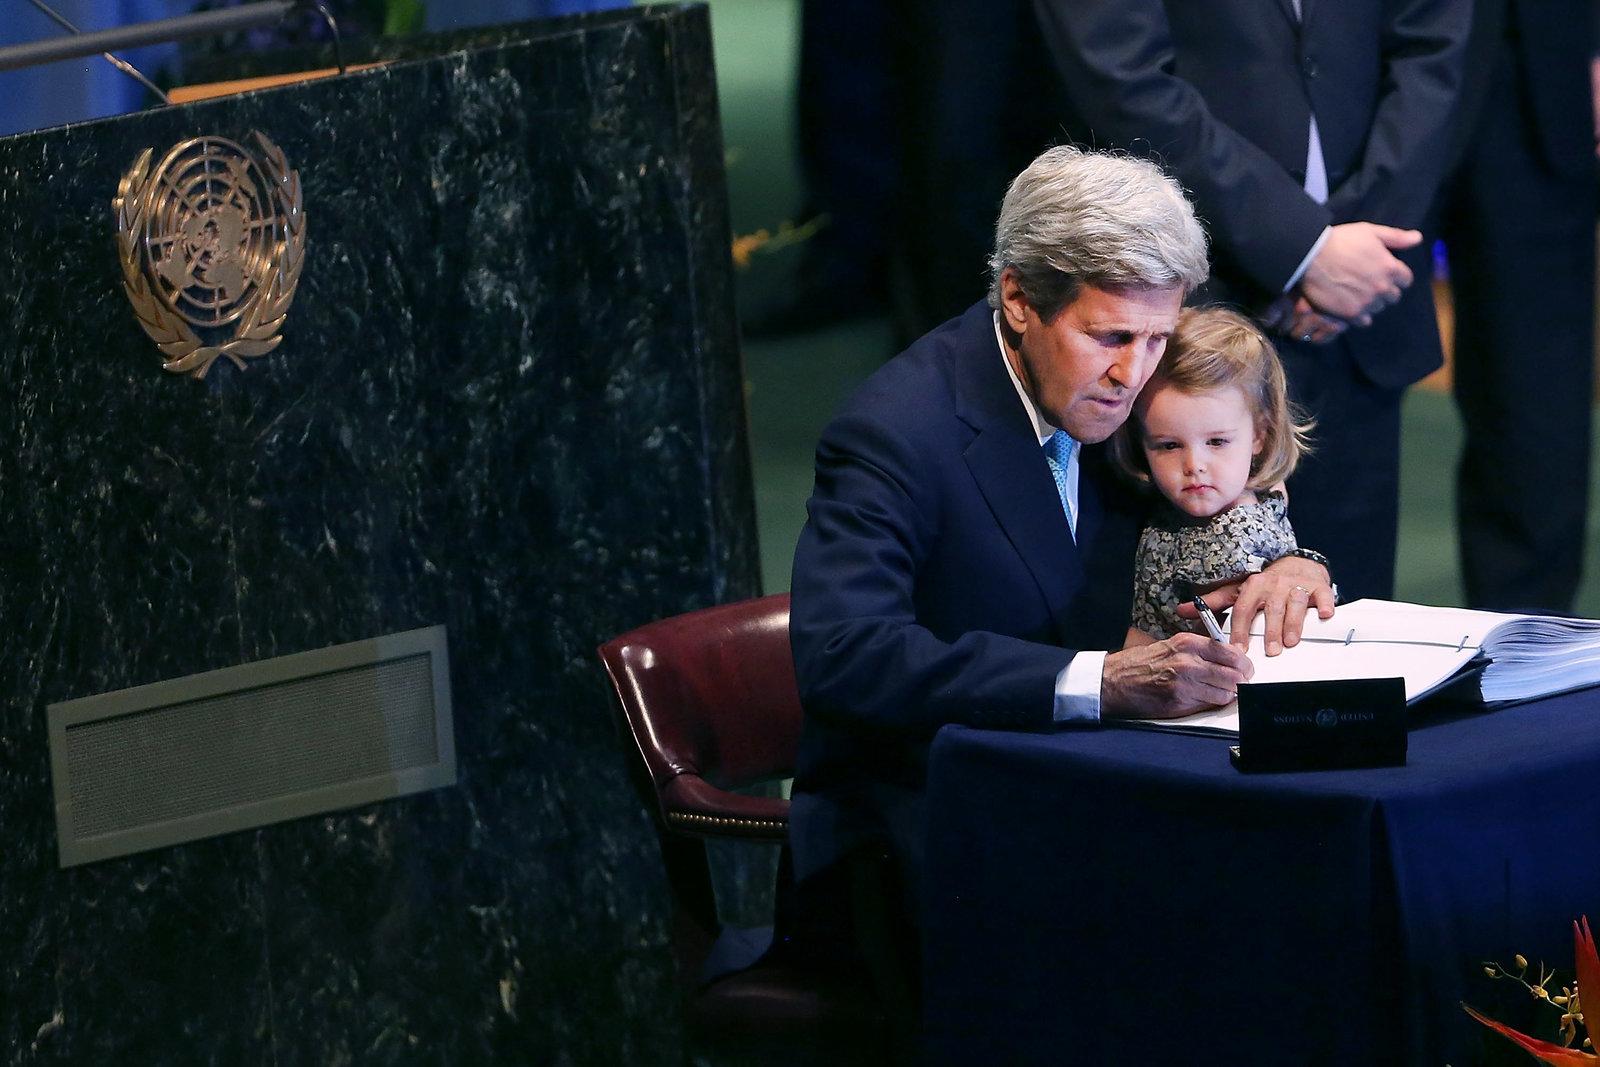 U.S. Secretary of State John Kerry signs the international climate accord